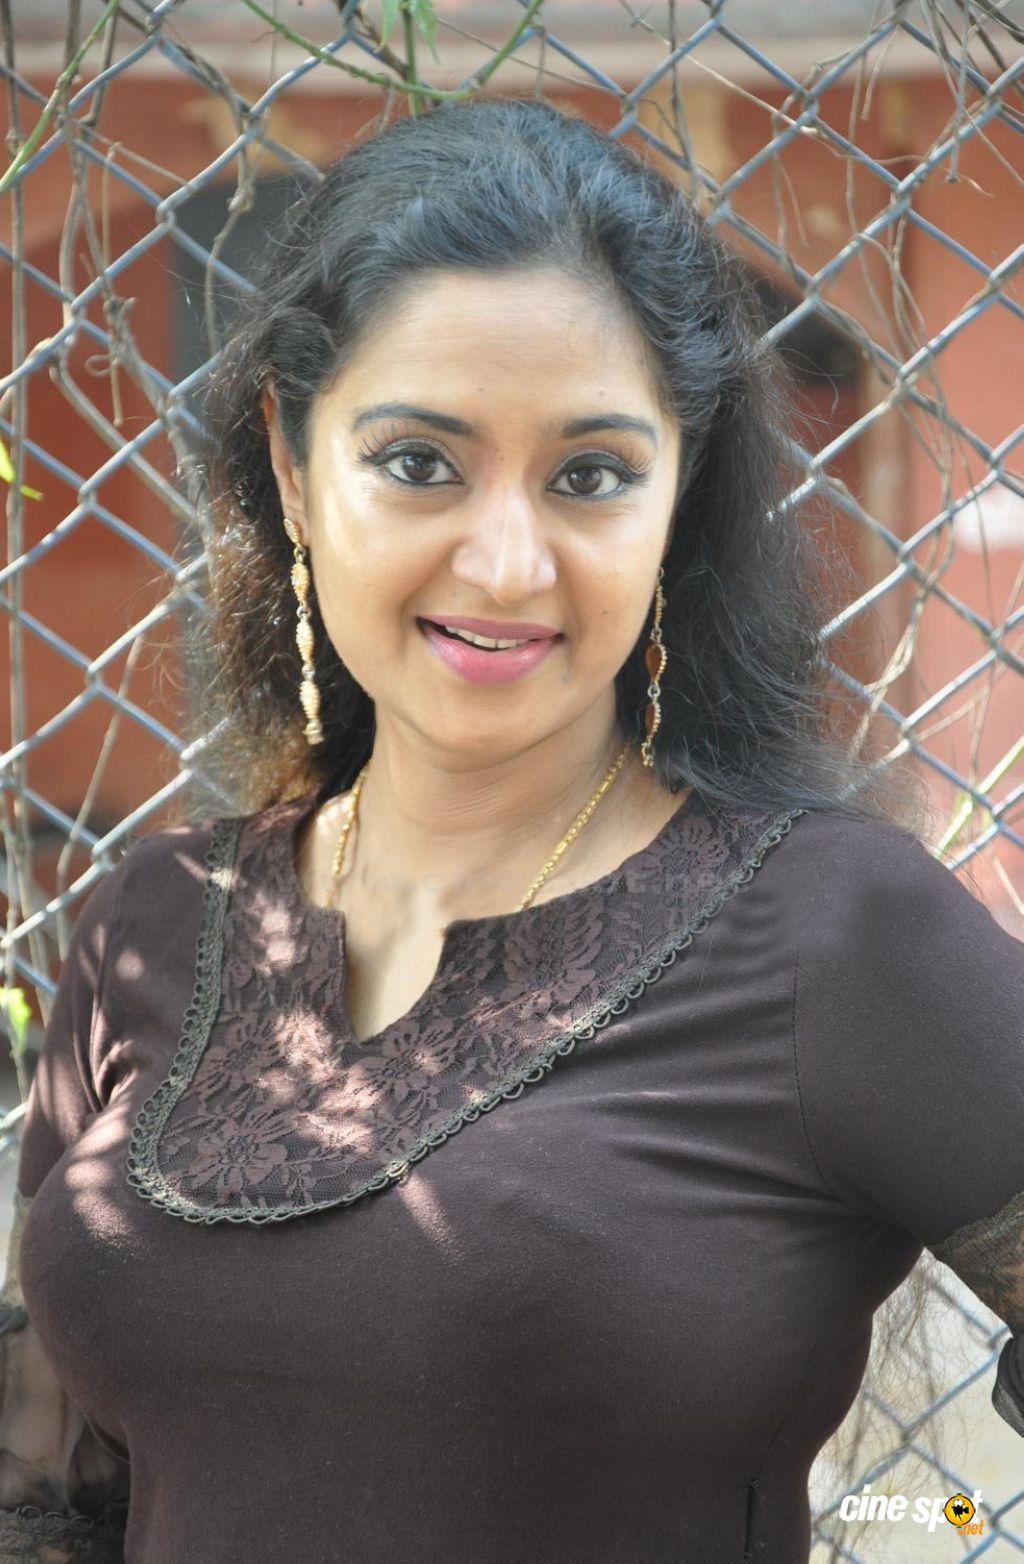 Unseen Tamil Actress Images Pics Hot: Charmila Malayalam ...